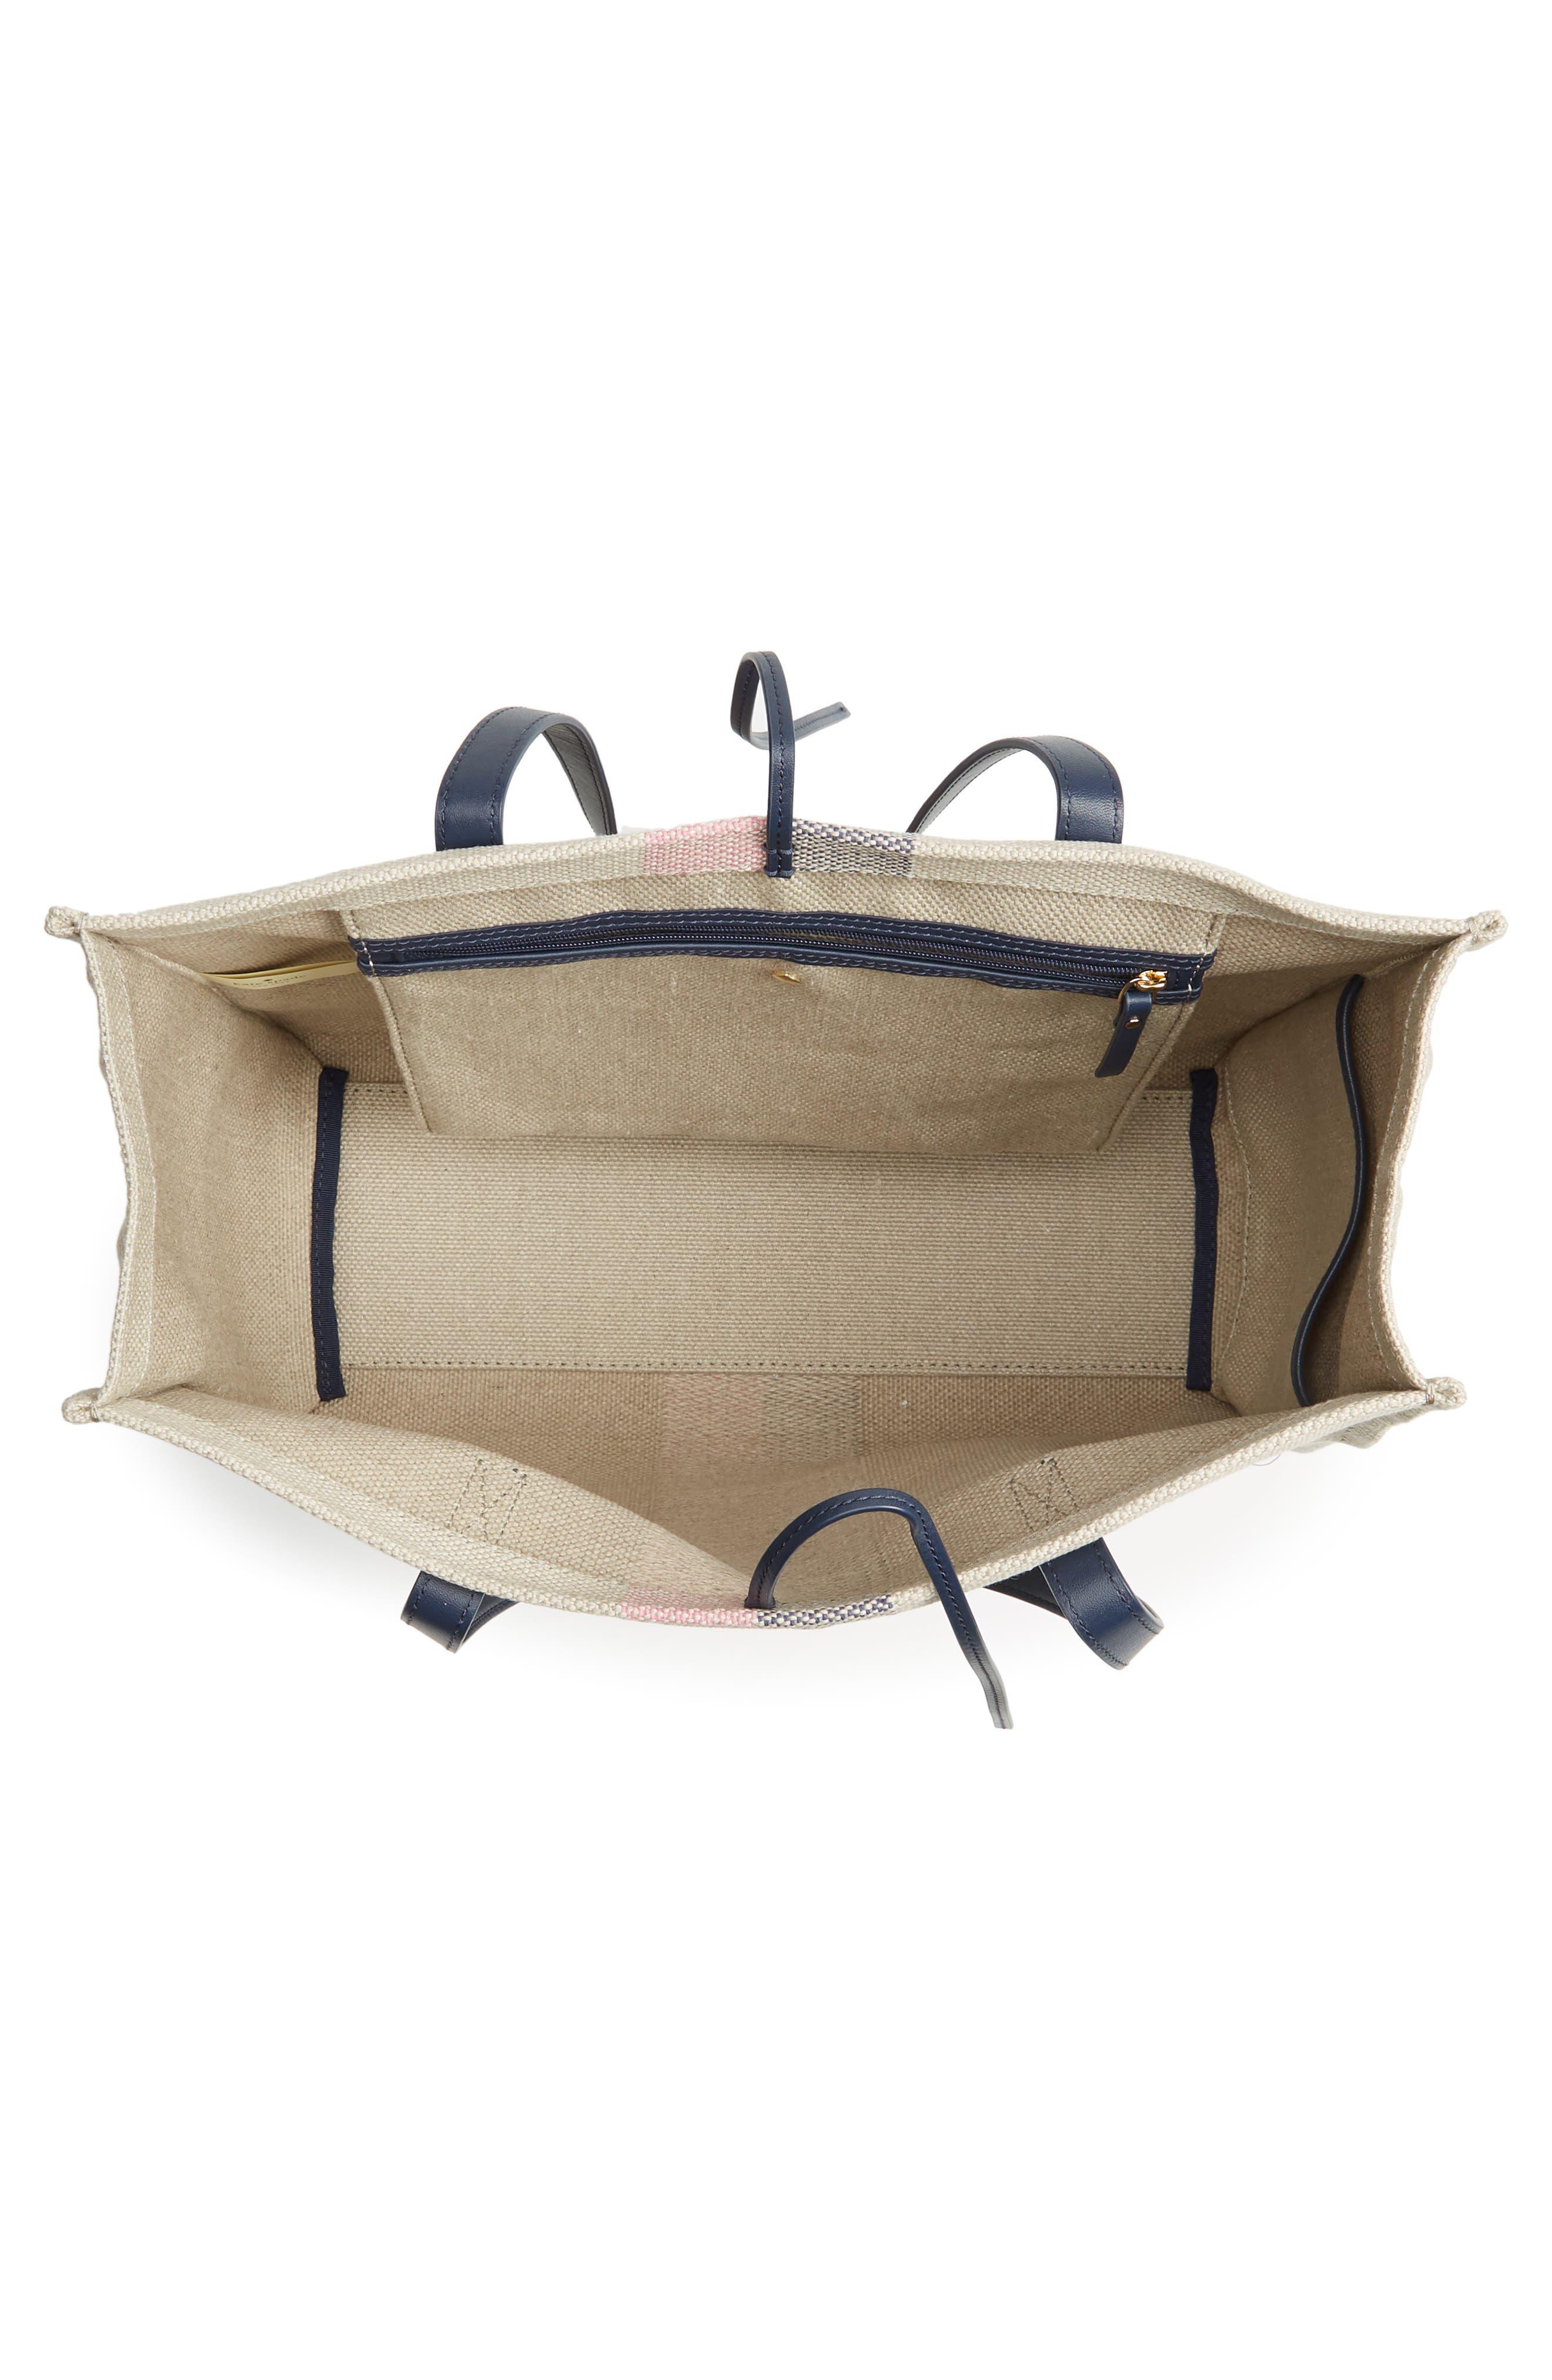 washington square - mega sam canvas satchel,                             Alternate thumbnail 4, color,                             Natural Linen/Bubble Gum/Navy